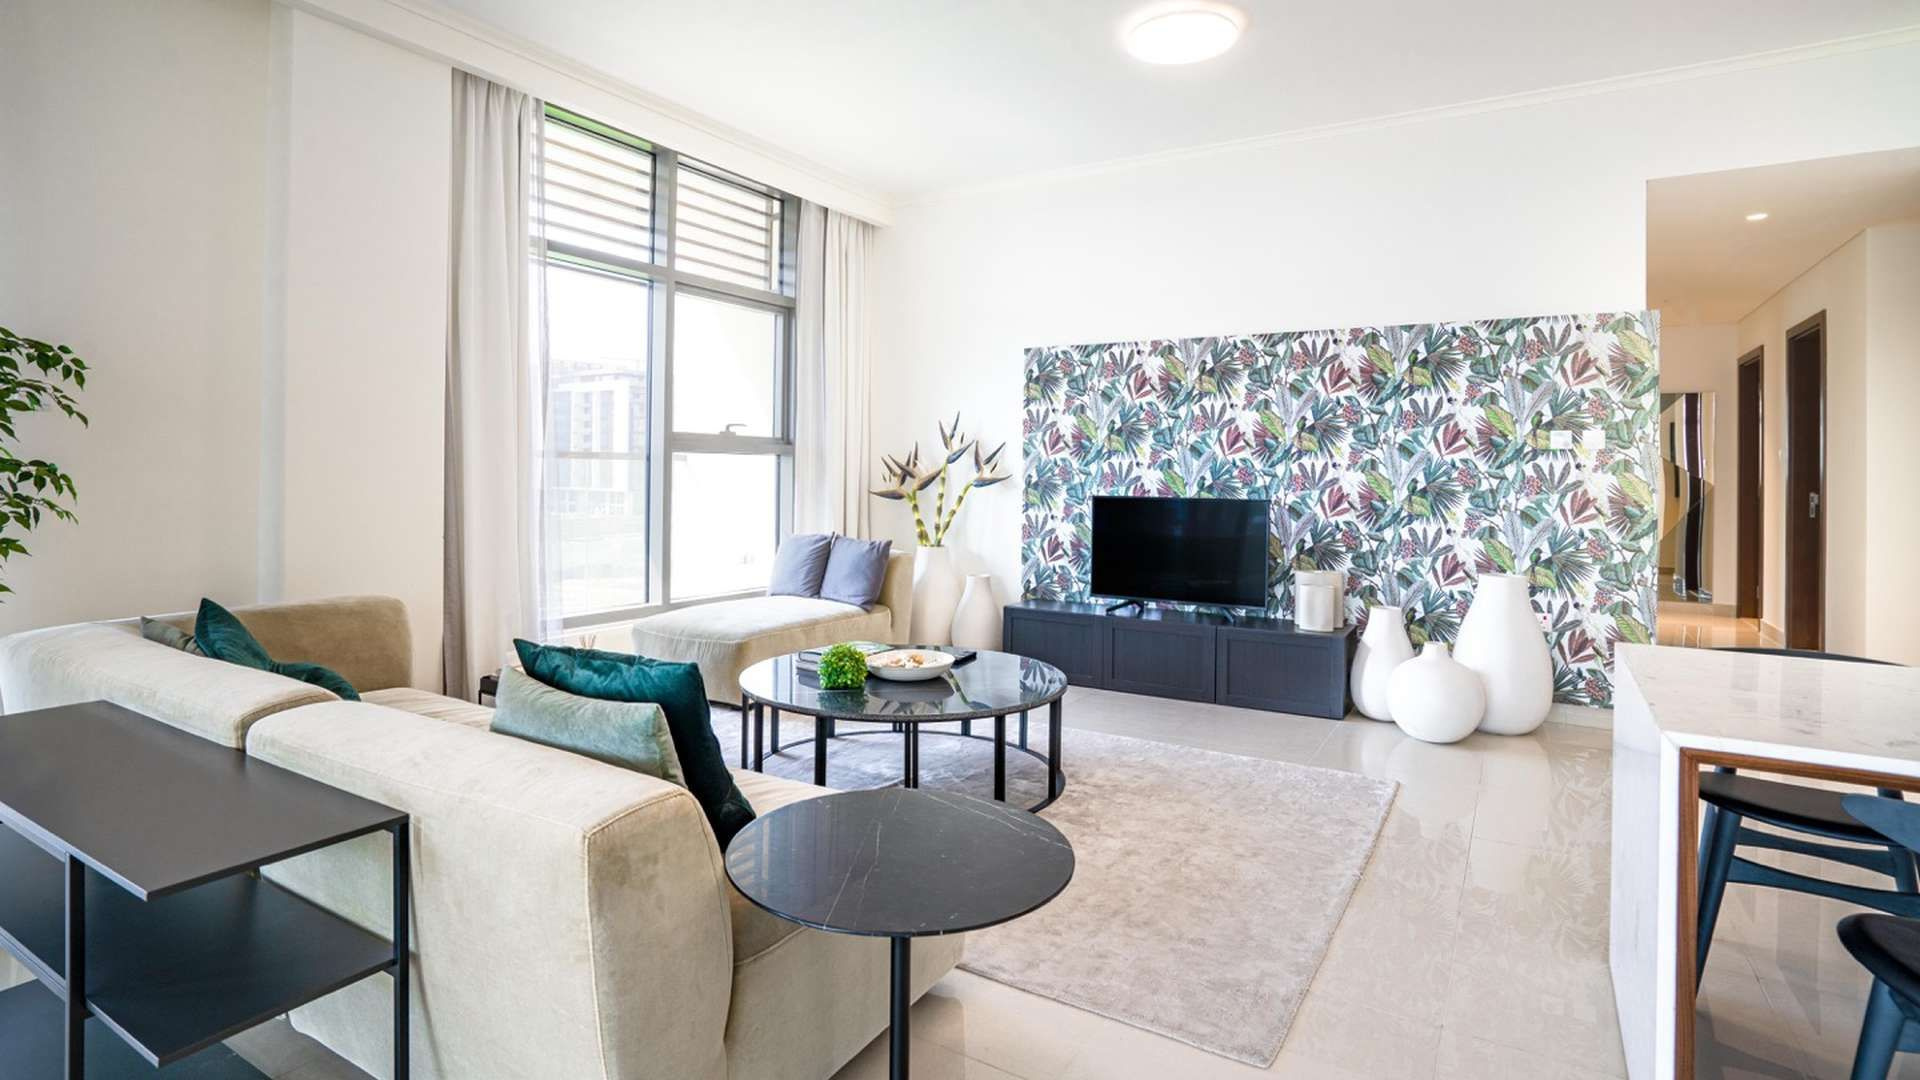 Luxury Apartments For Sale In Dubai Hills Estate Luxuryproperty Com Apartments For Rent Apartments For Sale Looking For Apartments